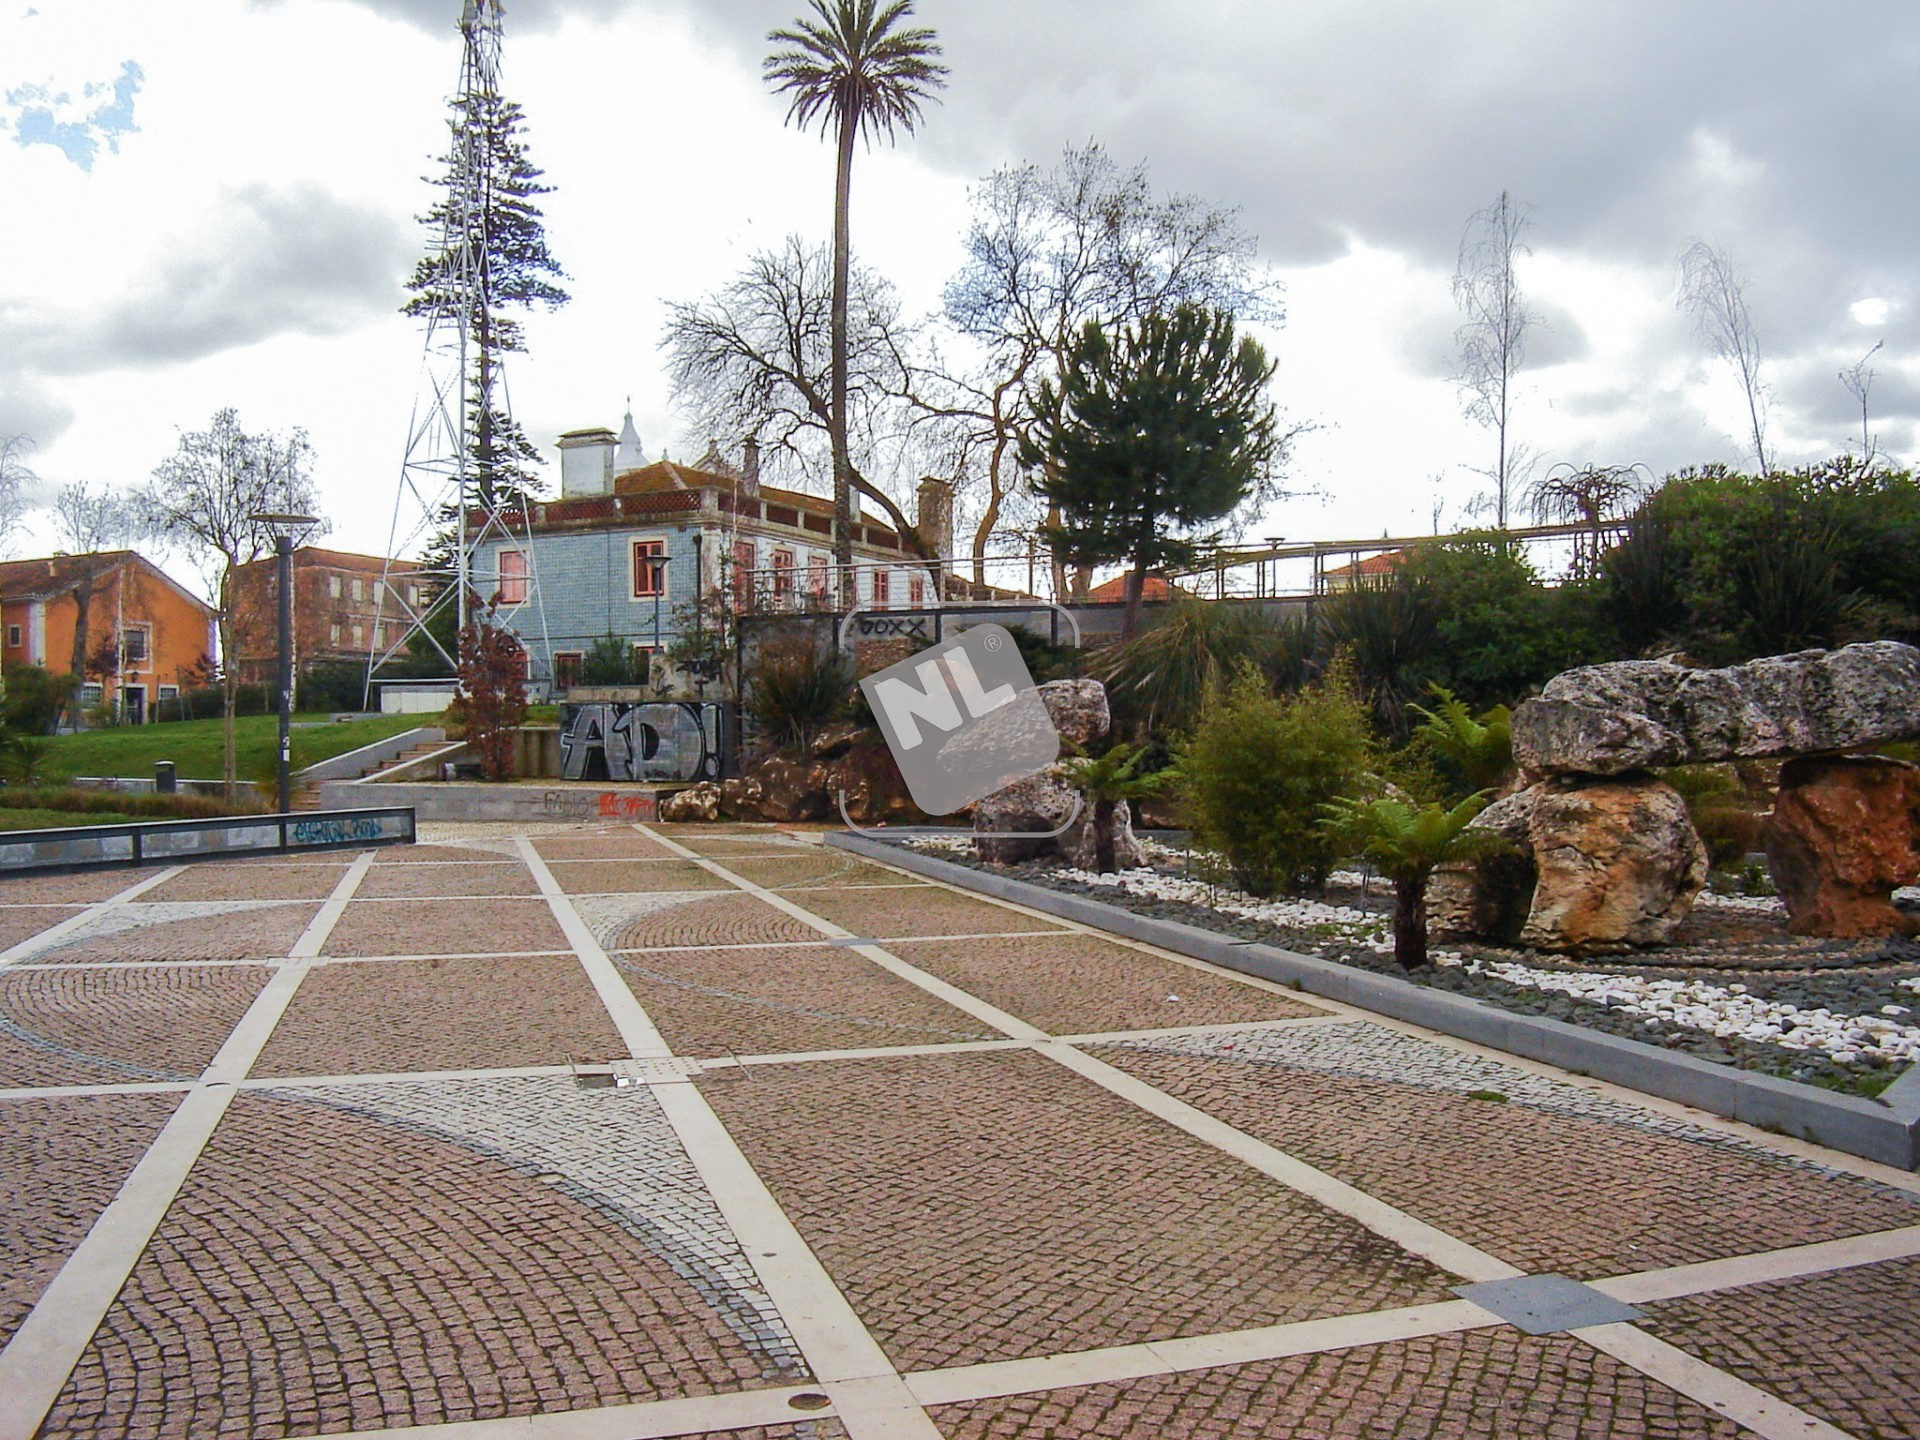 Praça Central 17